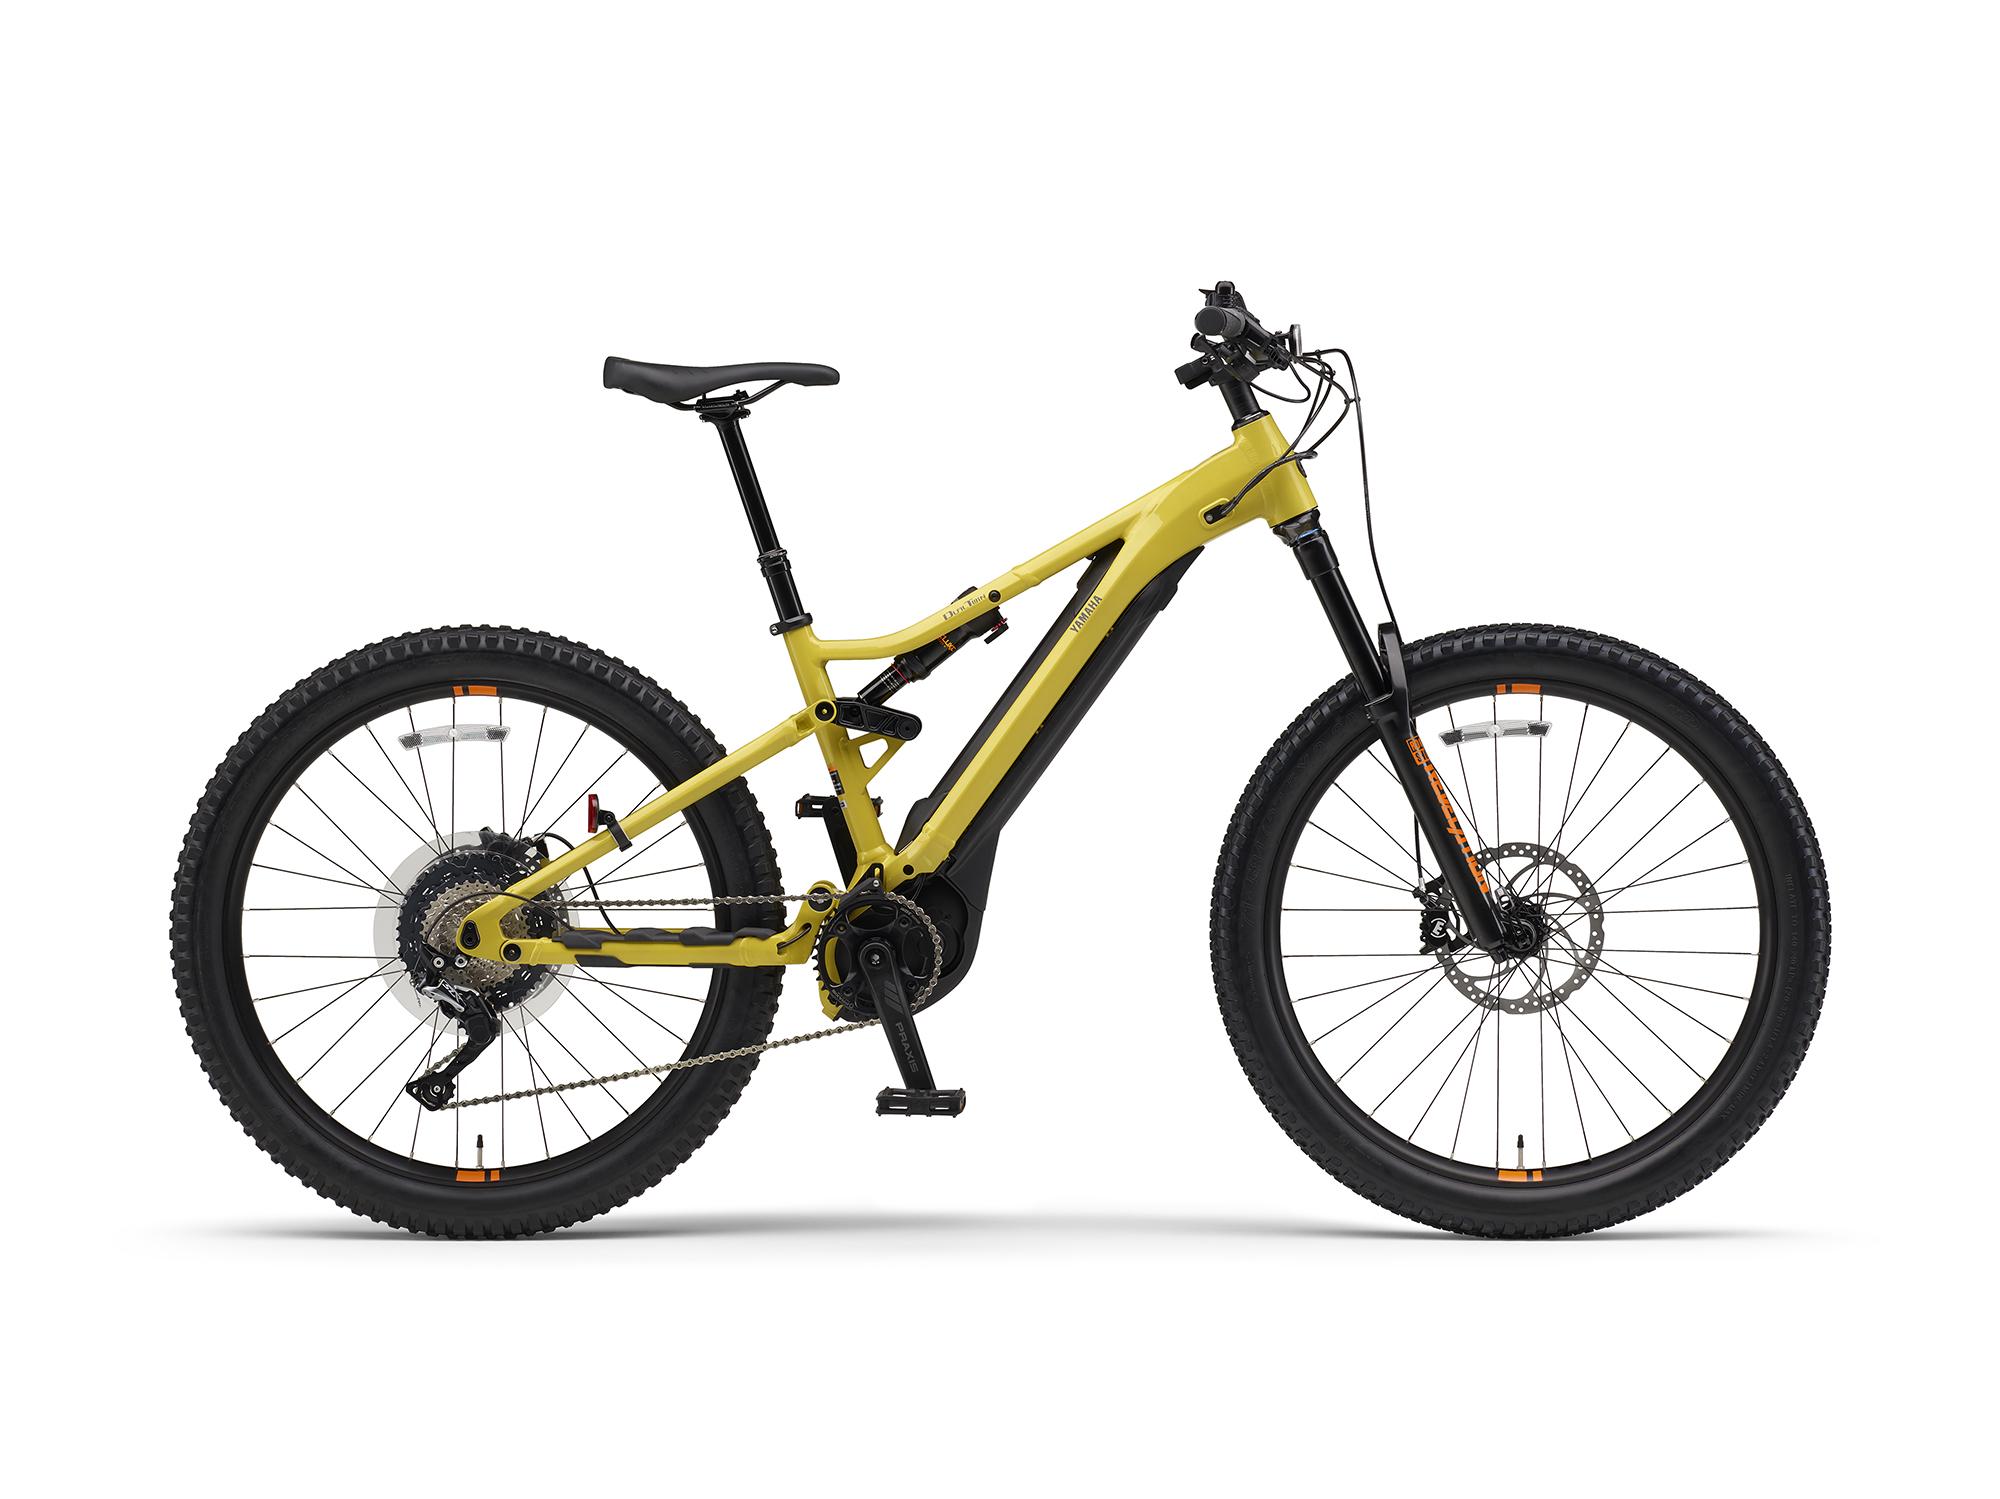 200805 2020-ydx-moro-yellow-usa-1